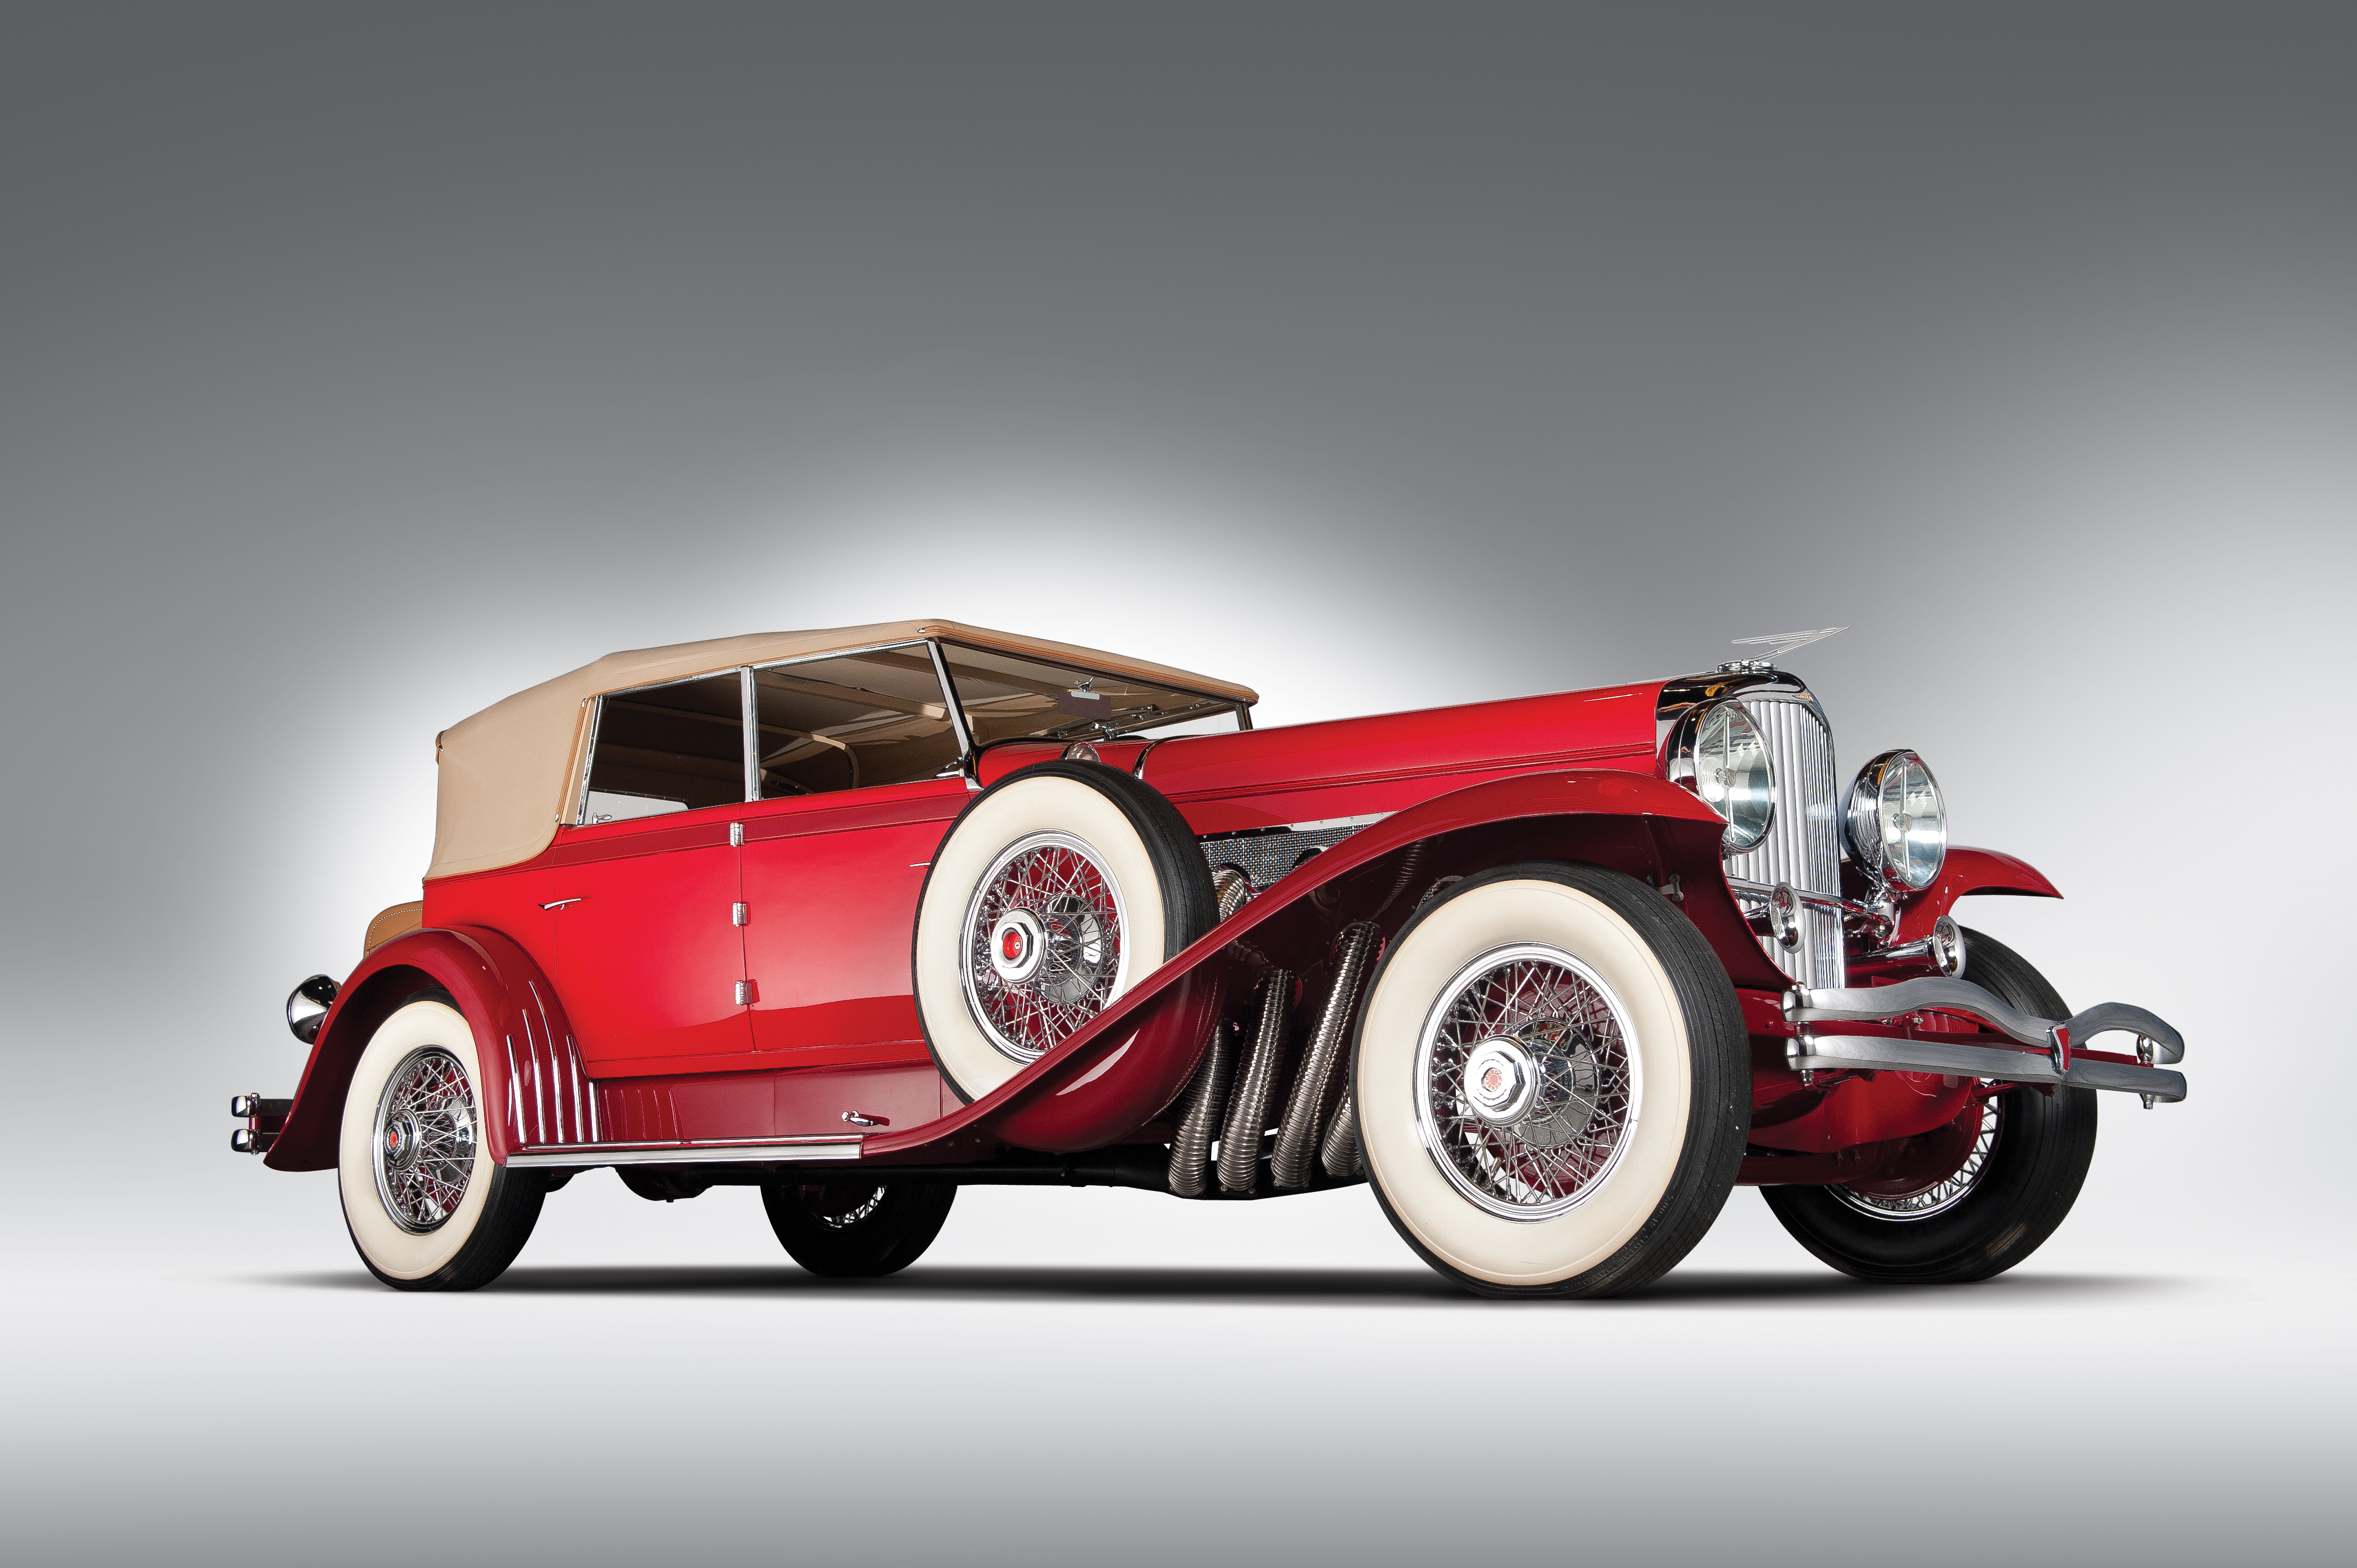 Vintage Car Wallpapers Vehicles Hq Vintage Car Pictures 4k Wallpapers 2019